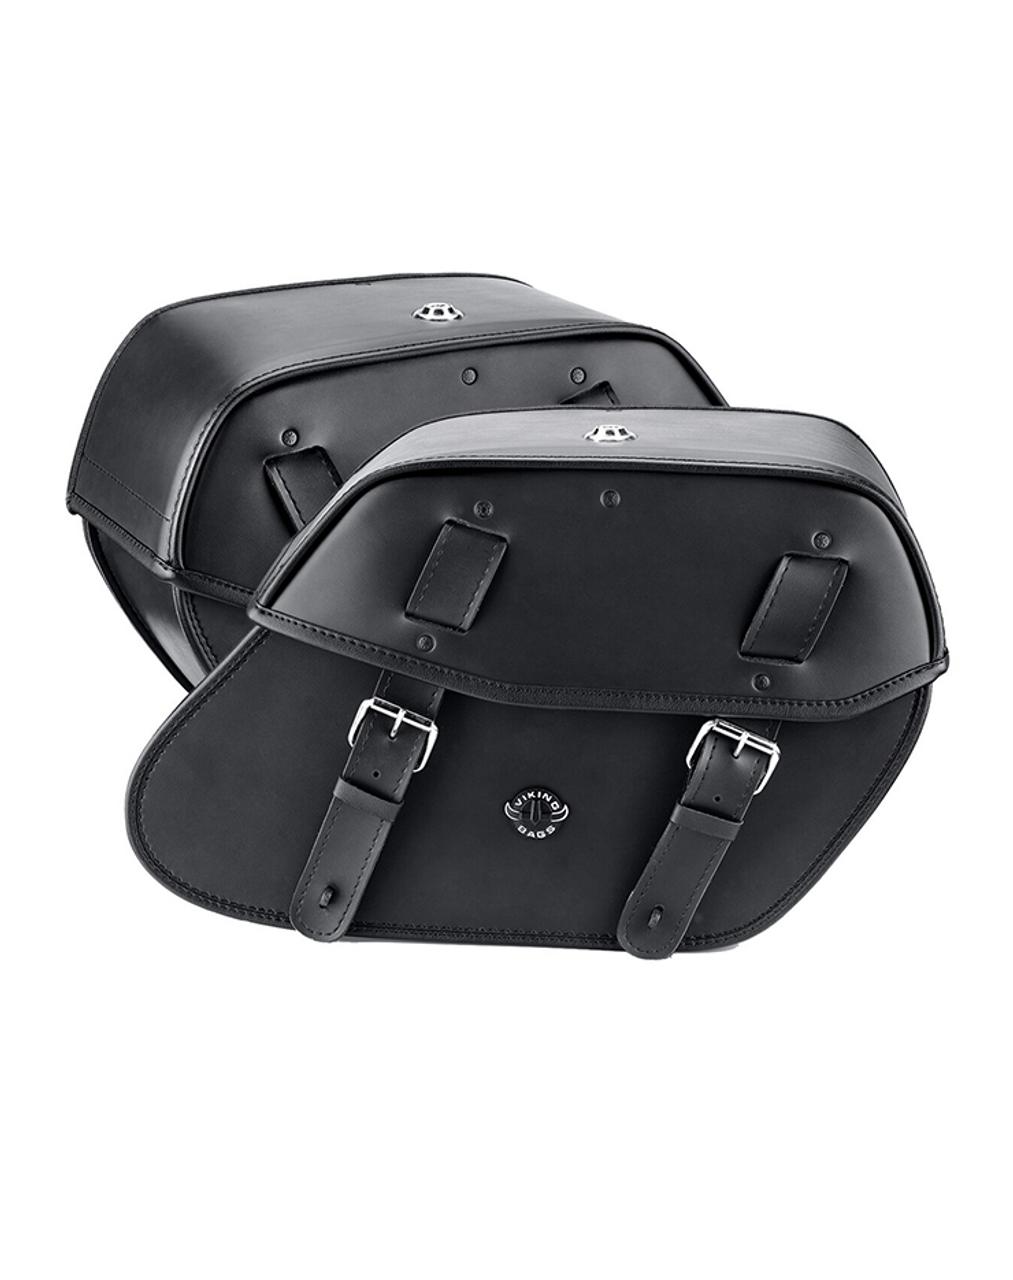 Viking Odin Medium Motorcycle Saddlebags For Harley Softail Custom FXSTC Both Bags View